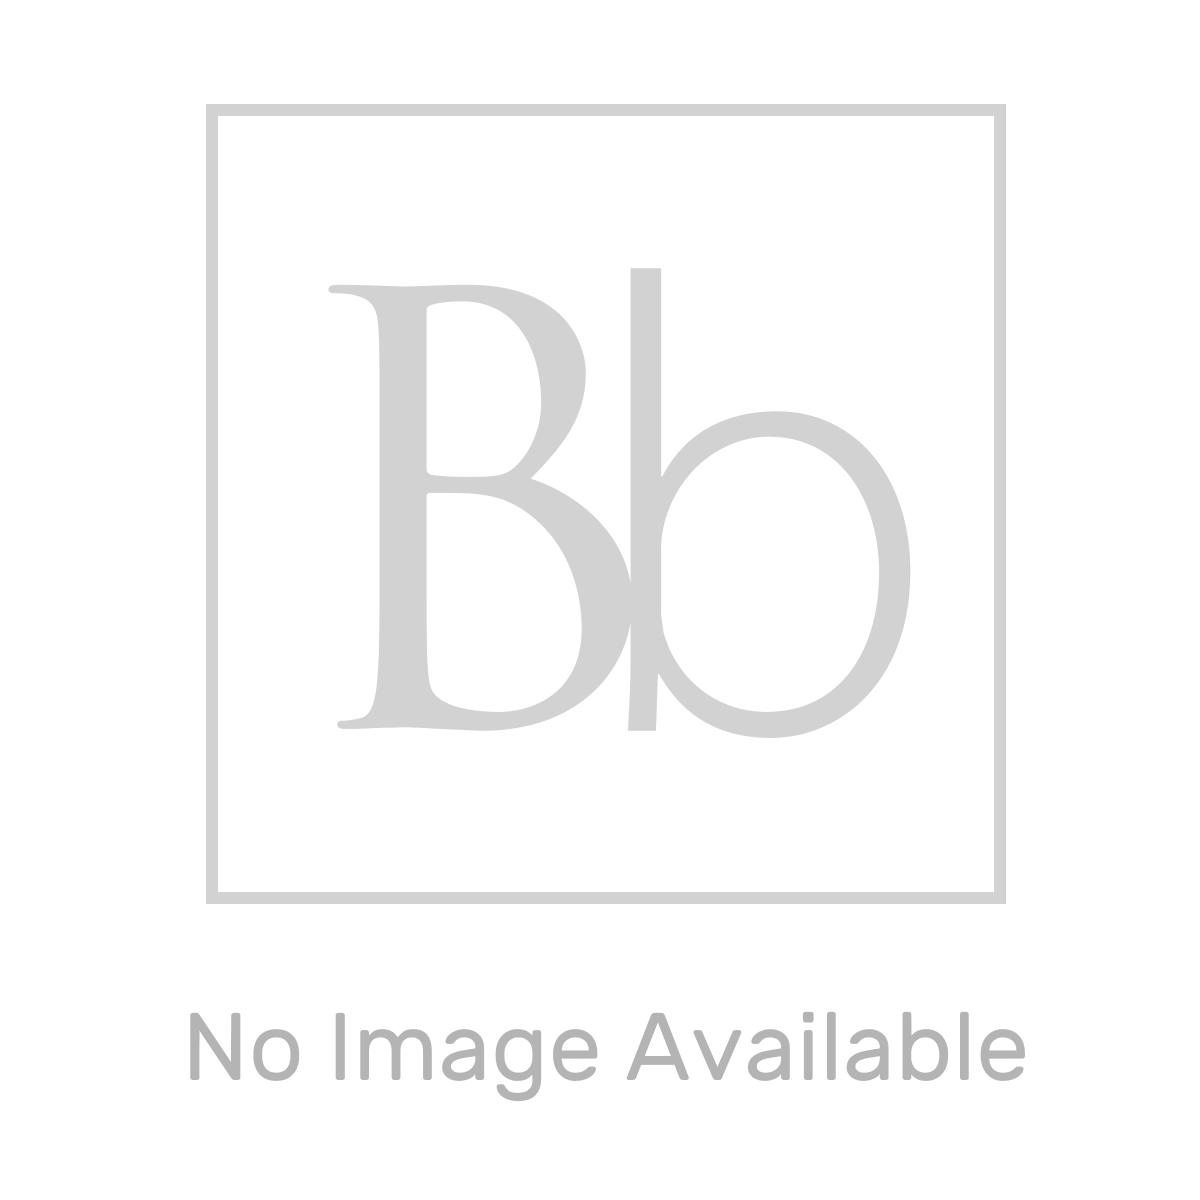 Frontline Blok Gloss White Wooden Shower Bath Front Panel 1700mm - Right Hand